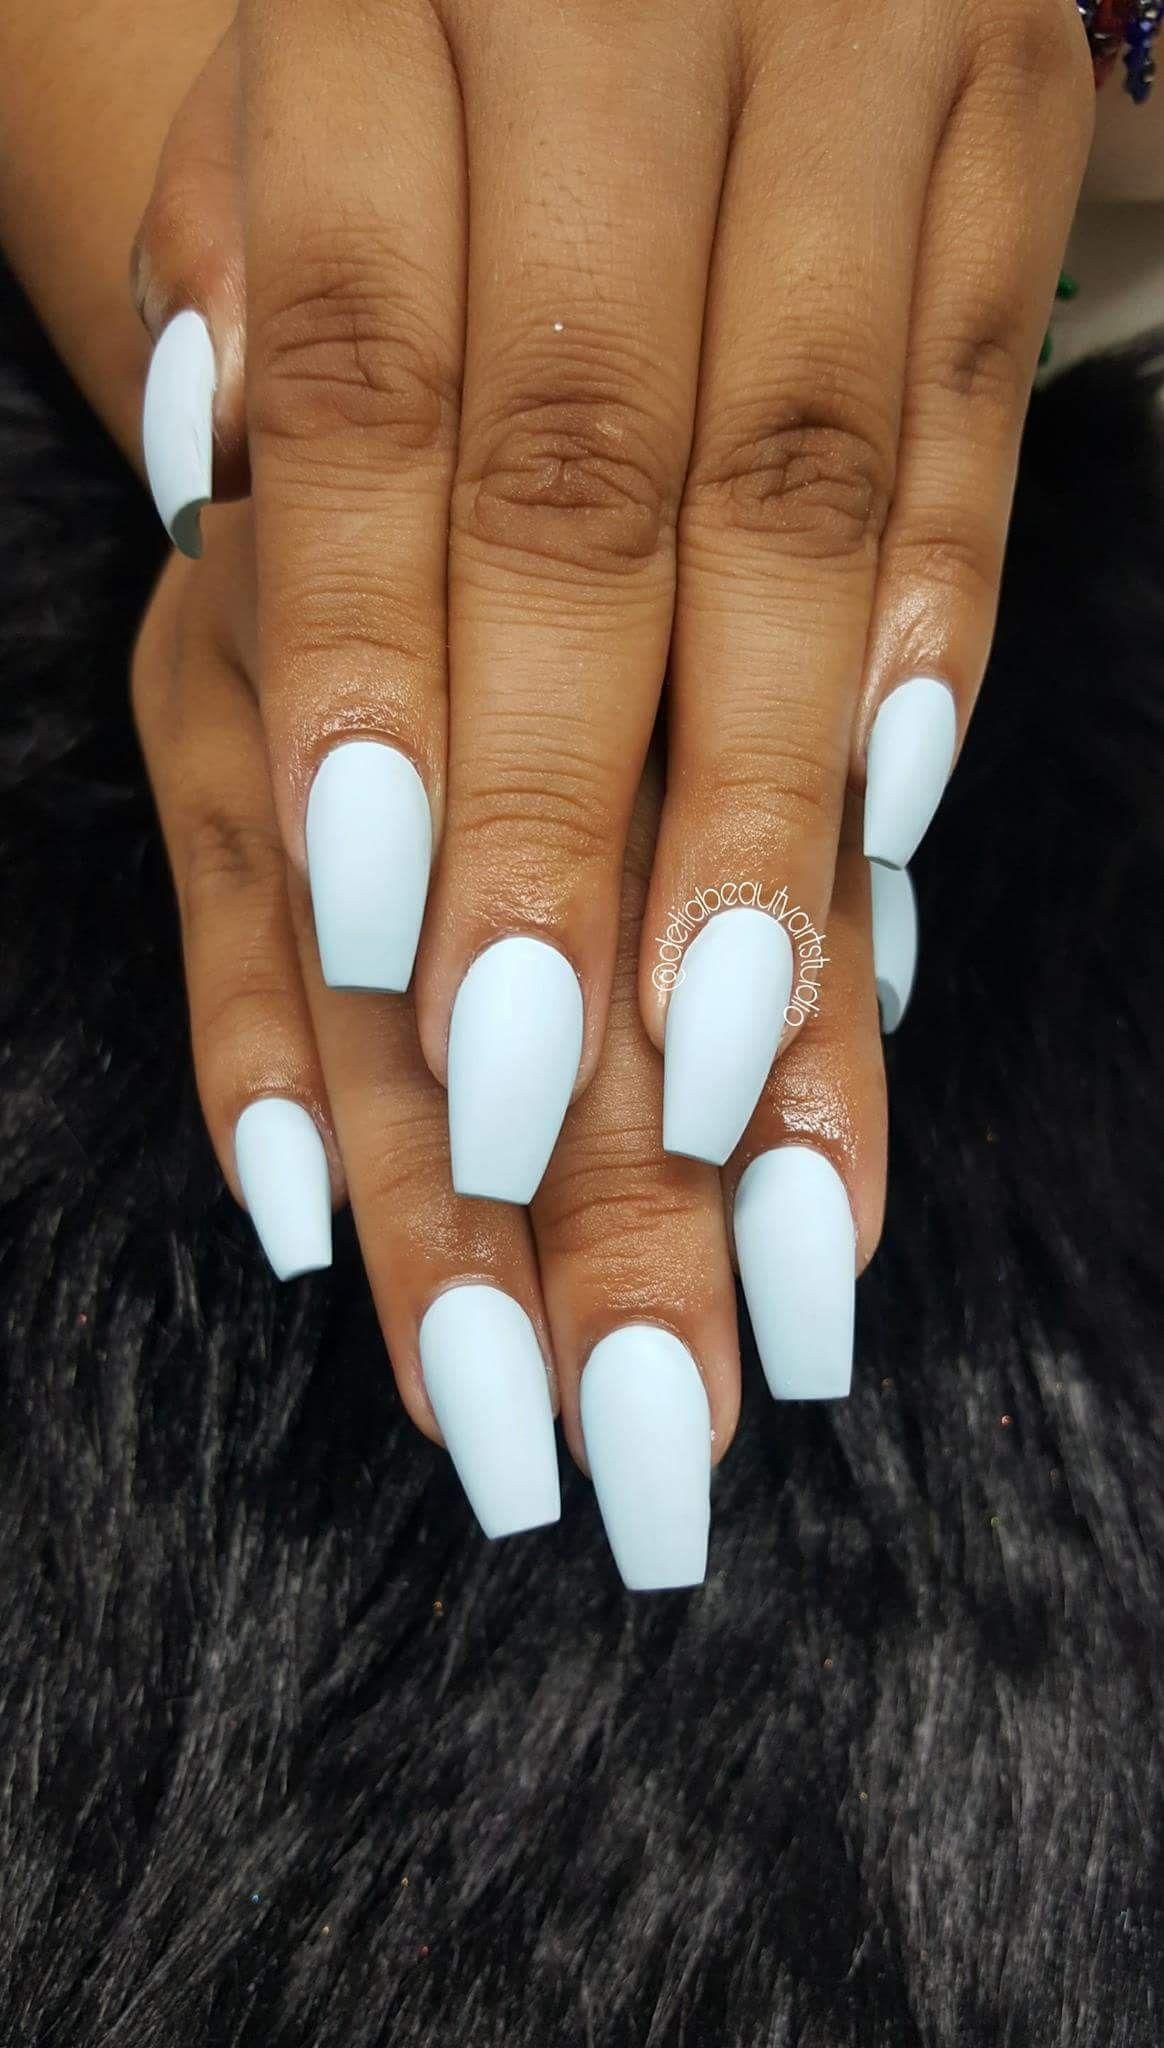 Baby blue nails, acrylic nails | Nail ideas | Pinterest | Baby blue ...